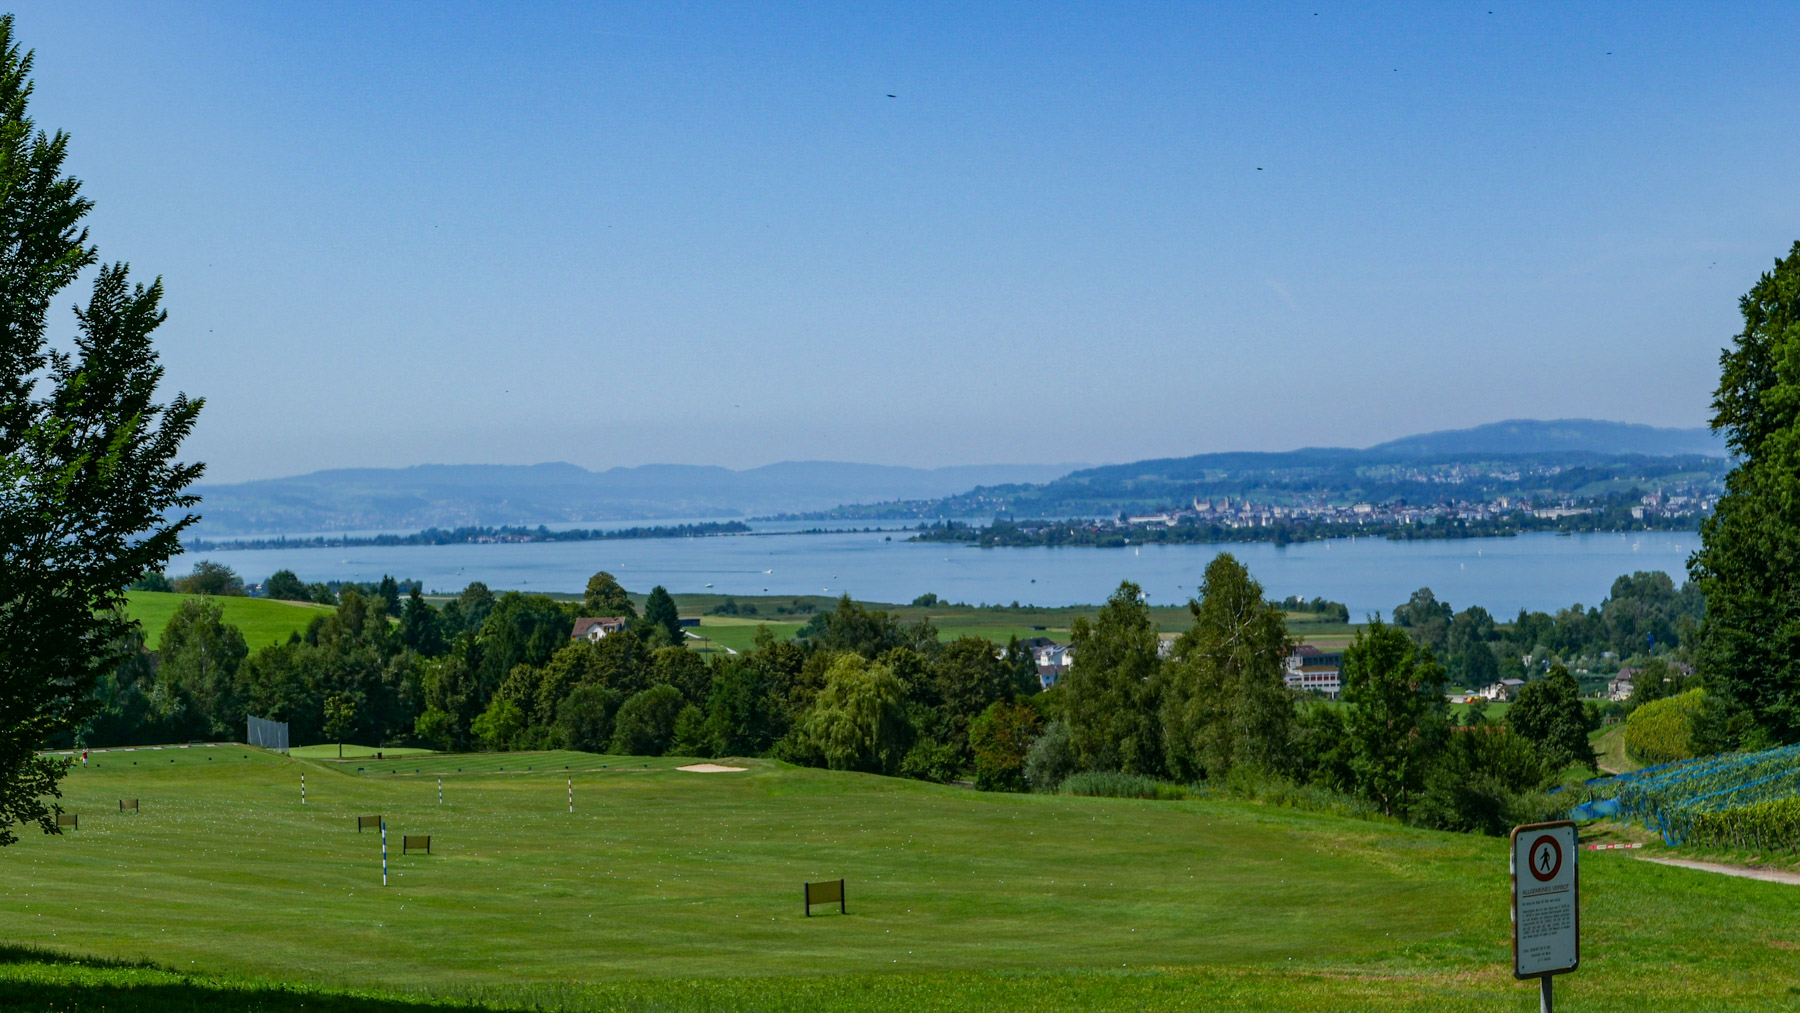 12b Golfplatz